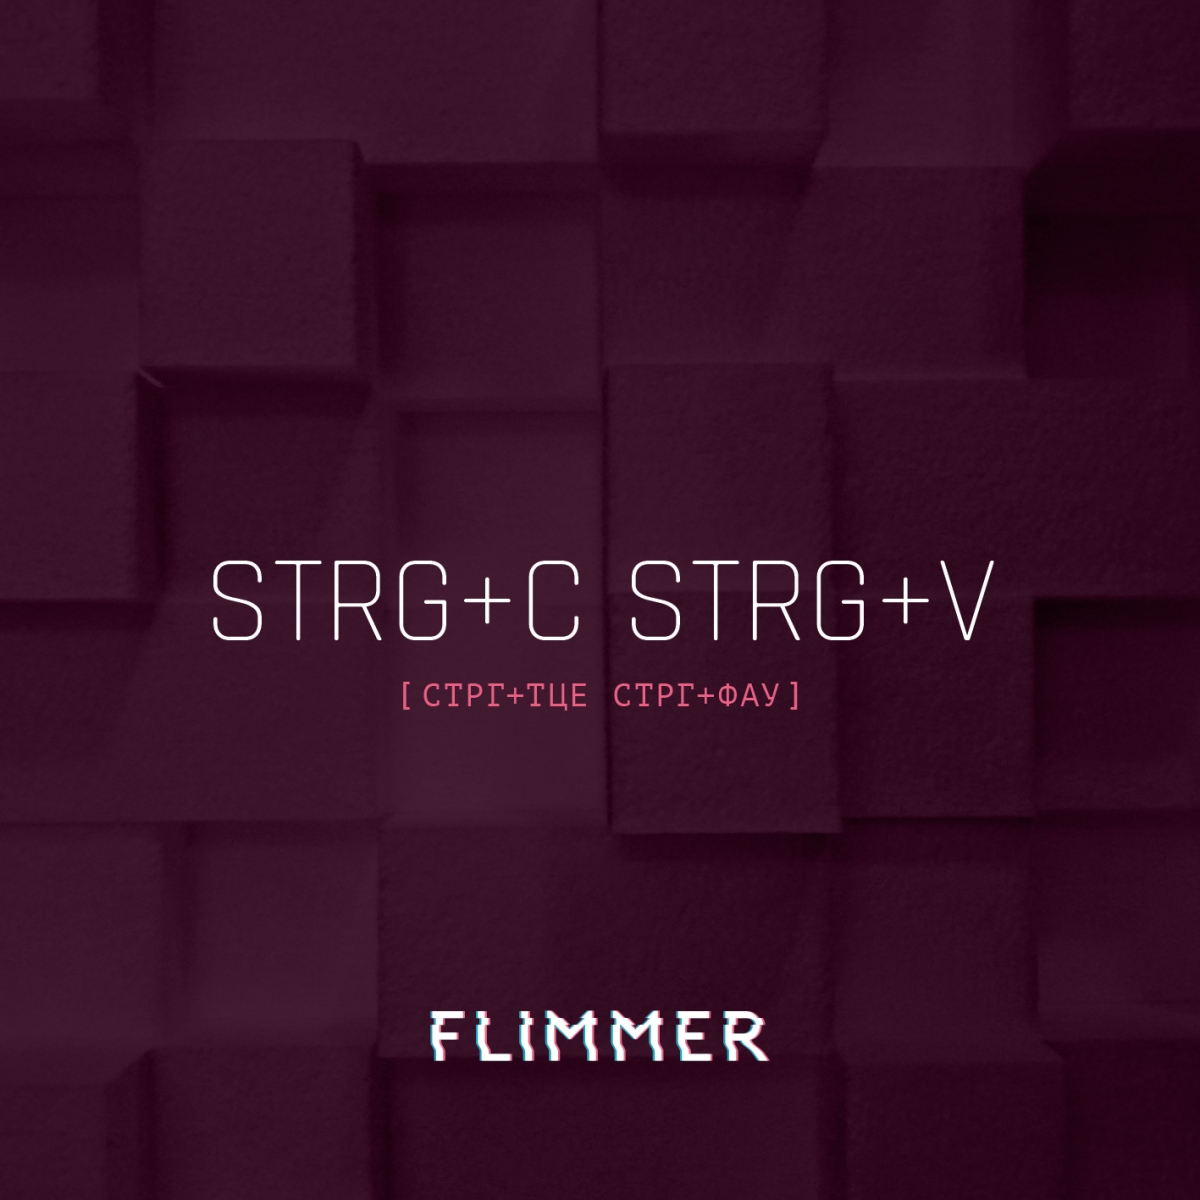 flimmer-strgc-strgv-video-premiere